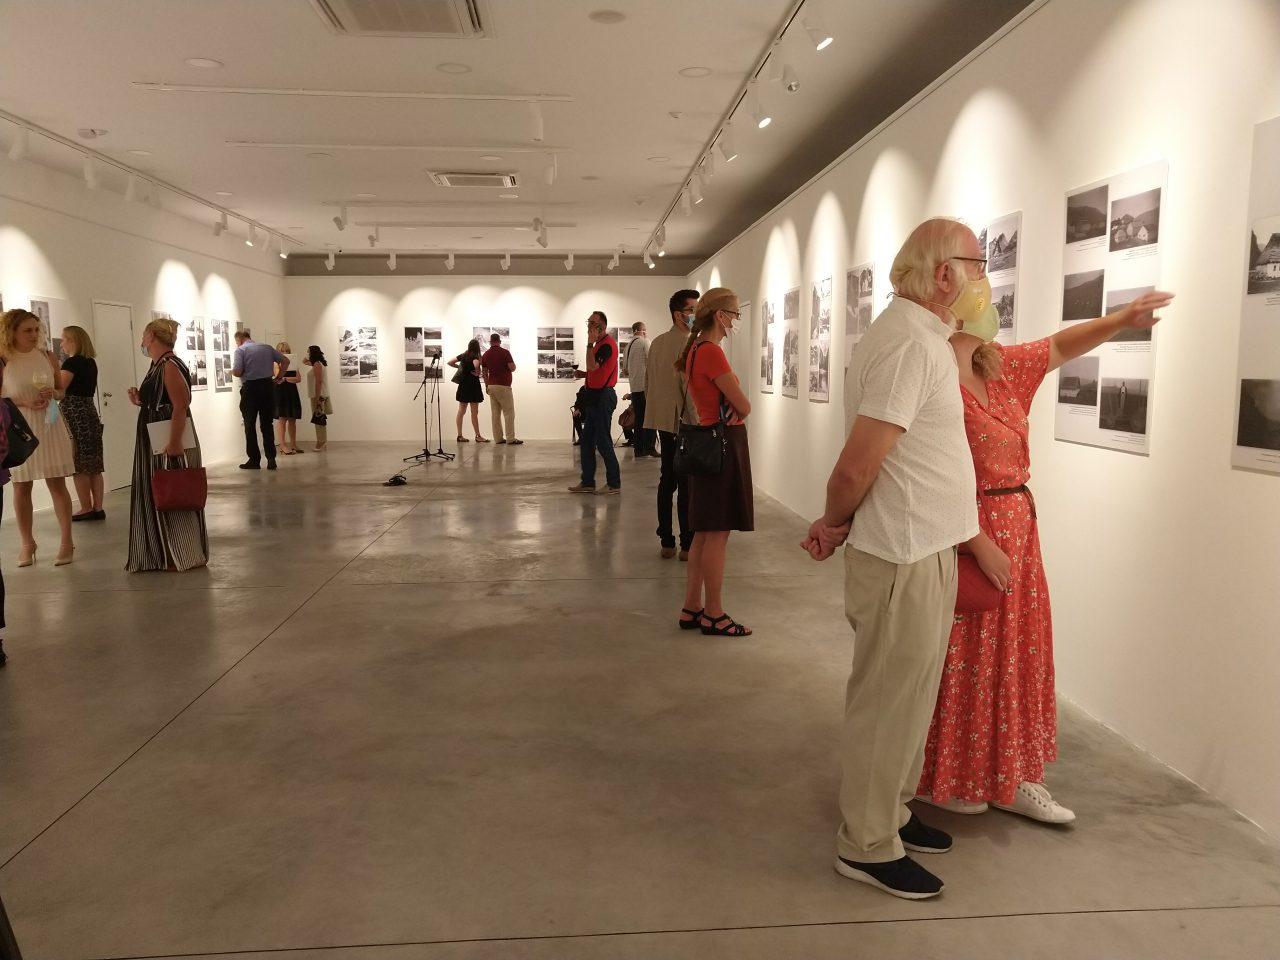 Otvorena izbložba starih fotografija Durmitora